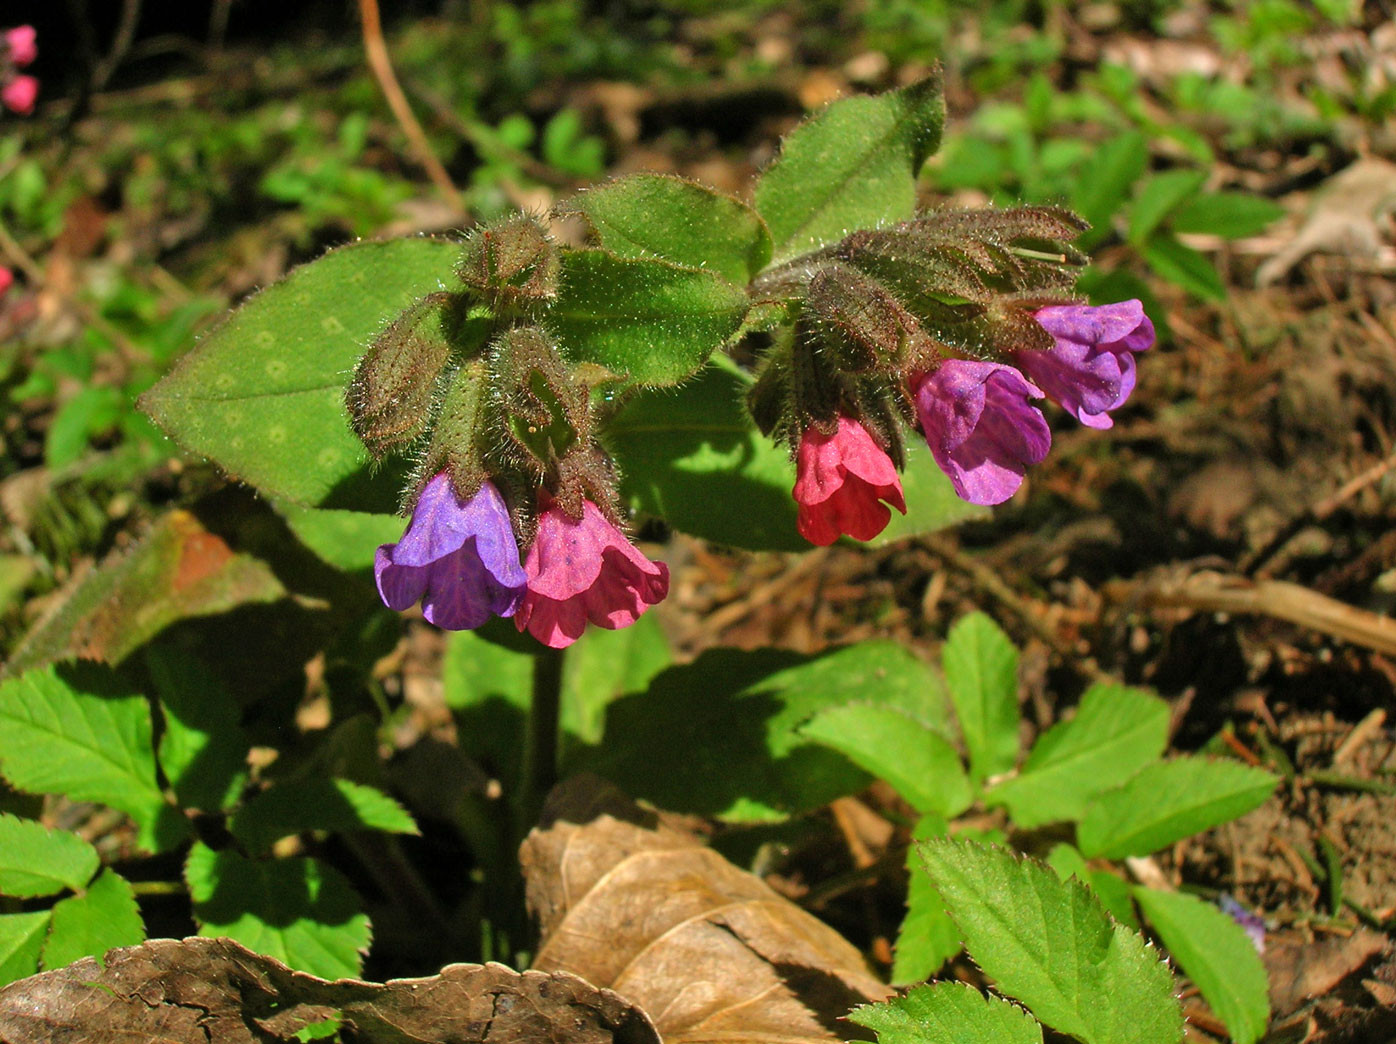 Echtes Lungenkraut (Pulmonaria officinalis) | RAUHBLATTGEWÄCHSE (Boraginaceae)